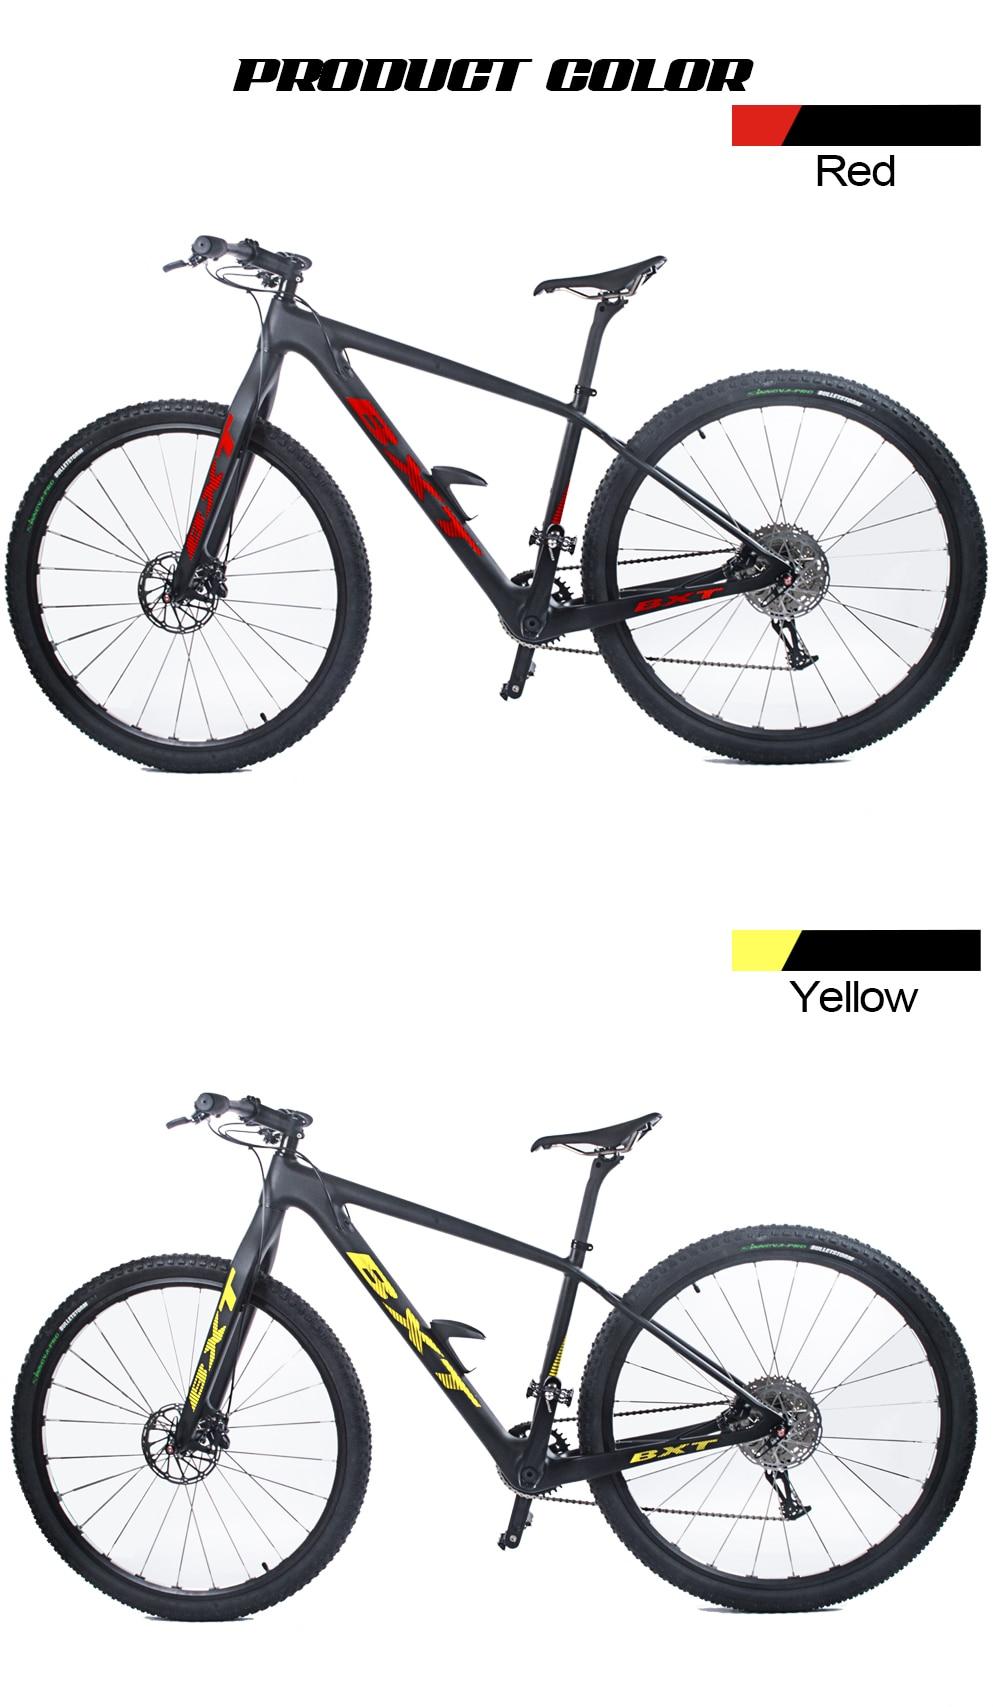 "H352a0df9dd9d4f9886537eb2c9dc1735X BXT 29inch carbon fiber Mountain bike 1*11 Speed Double Disc Brake 29"" MTB Men bicycle 29er wheel S/M/L frame complete bike"